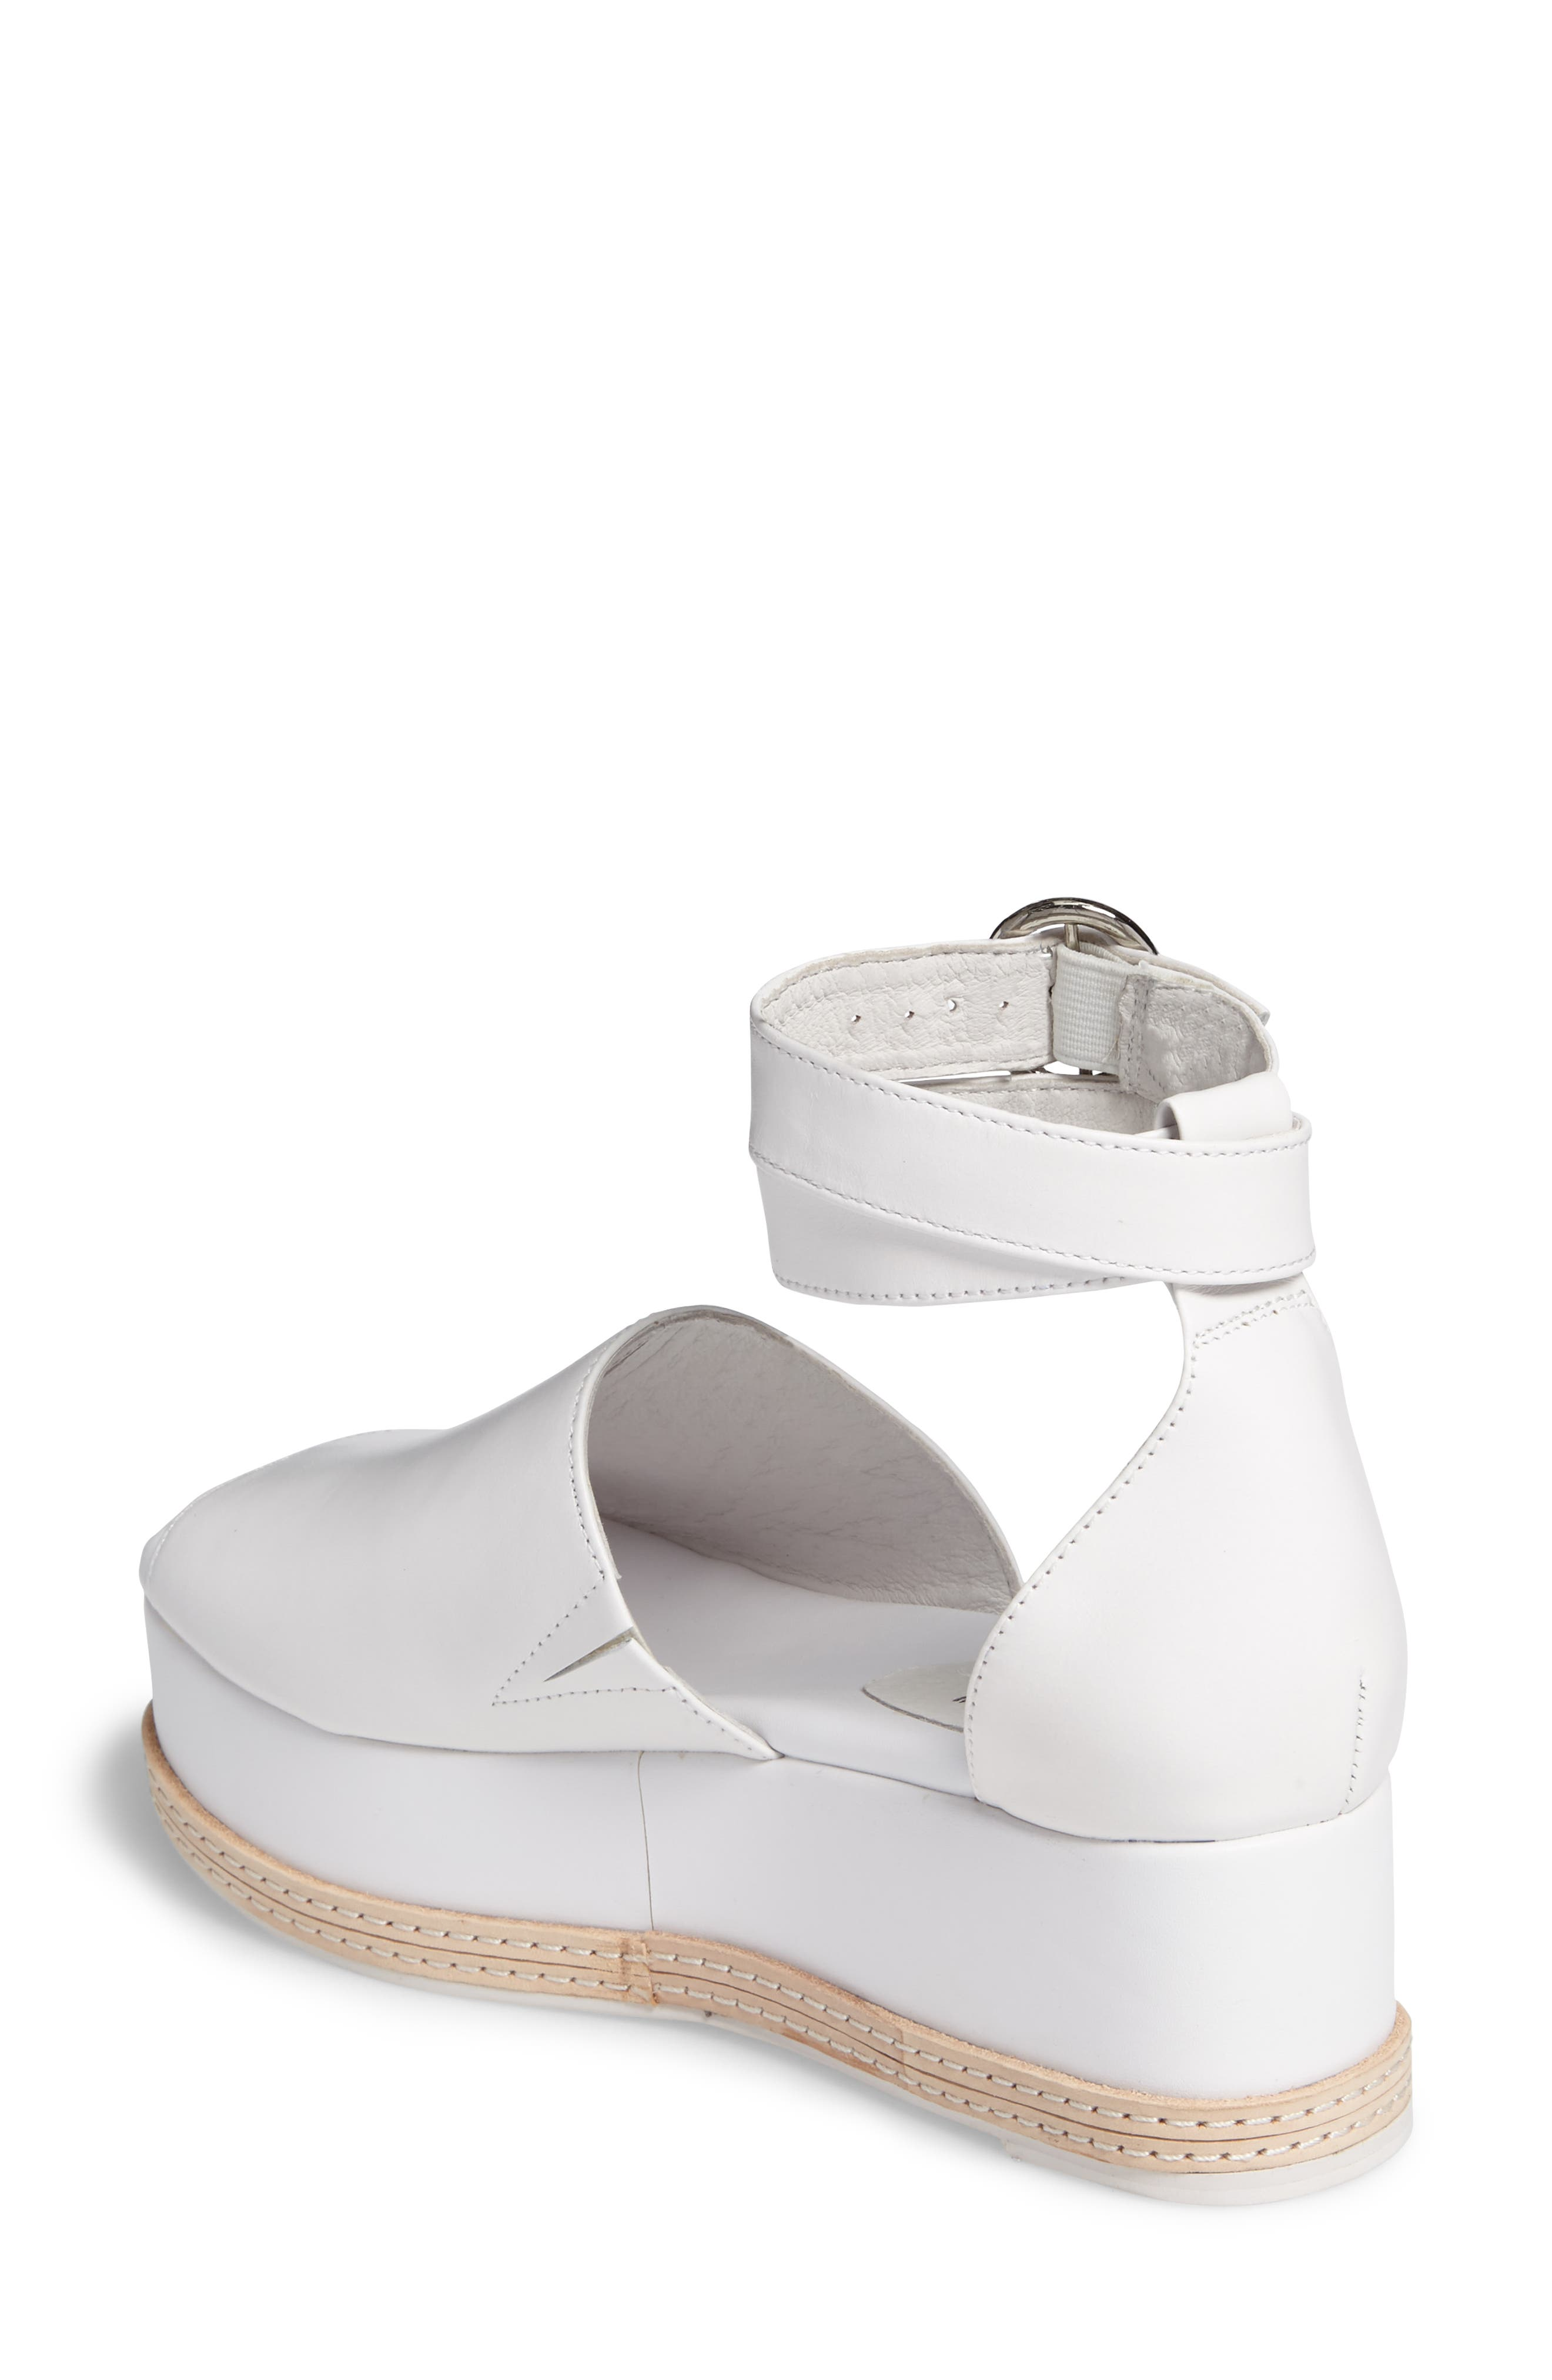 Baywood Ankle Strap Platform Sandal,                             Alternate thumbnail 2, color,                             100